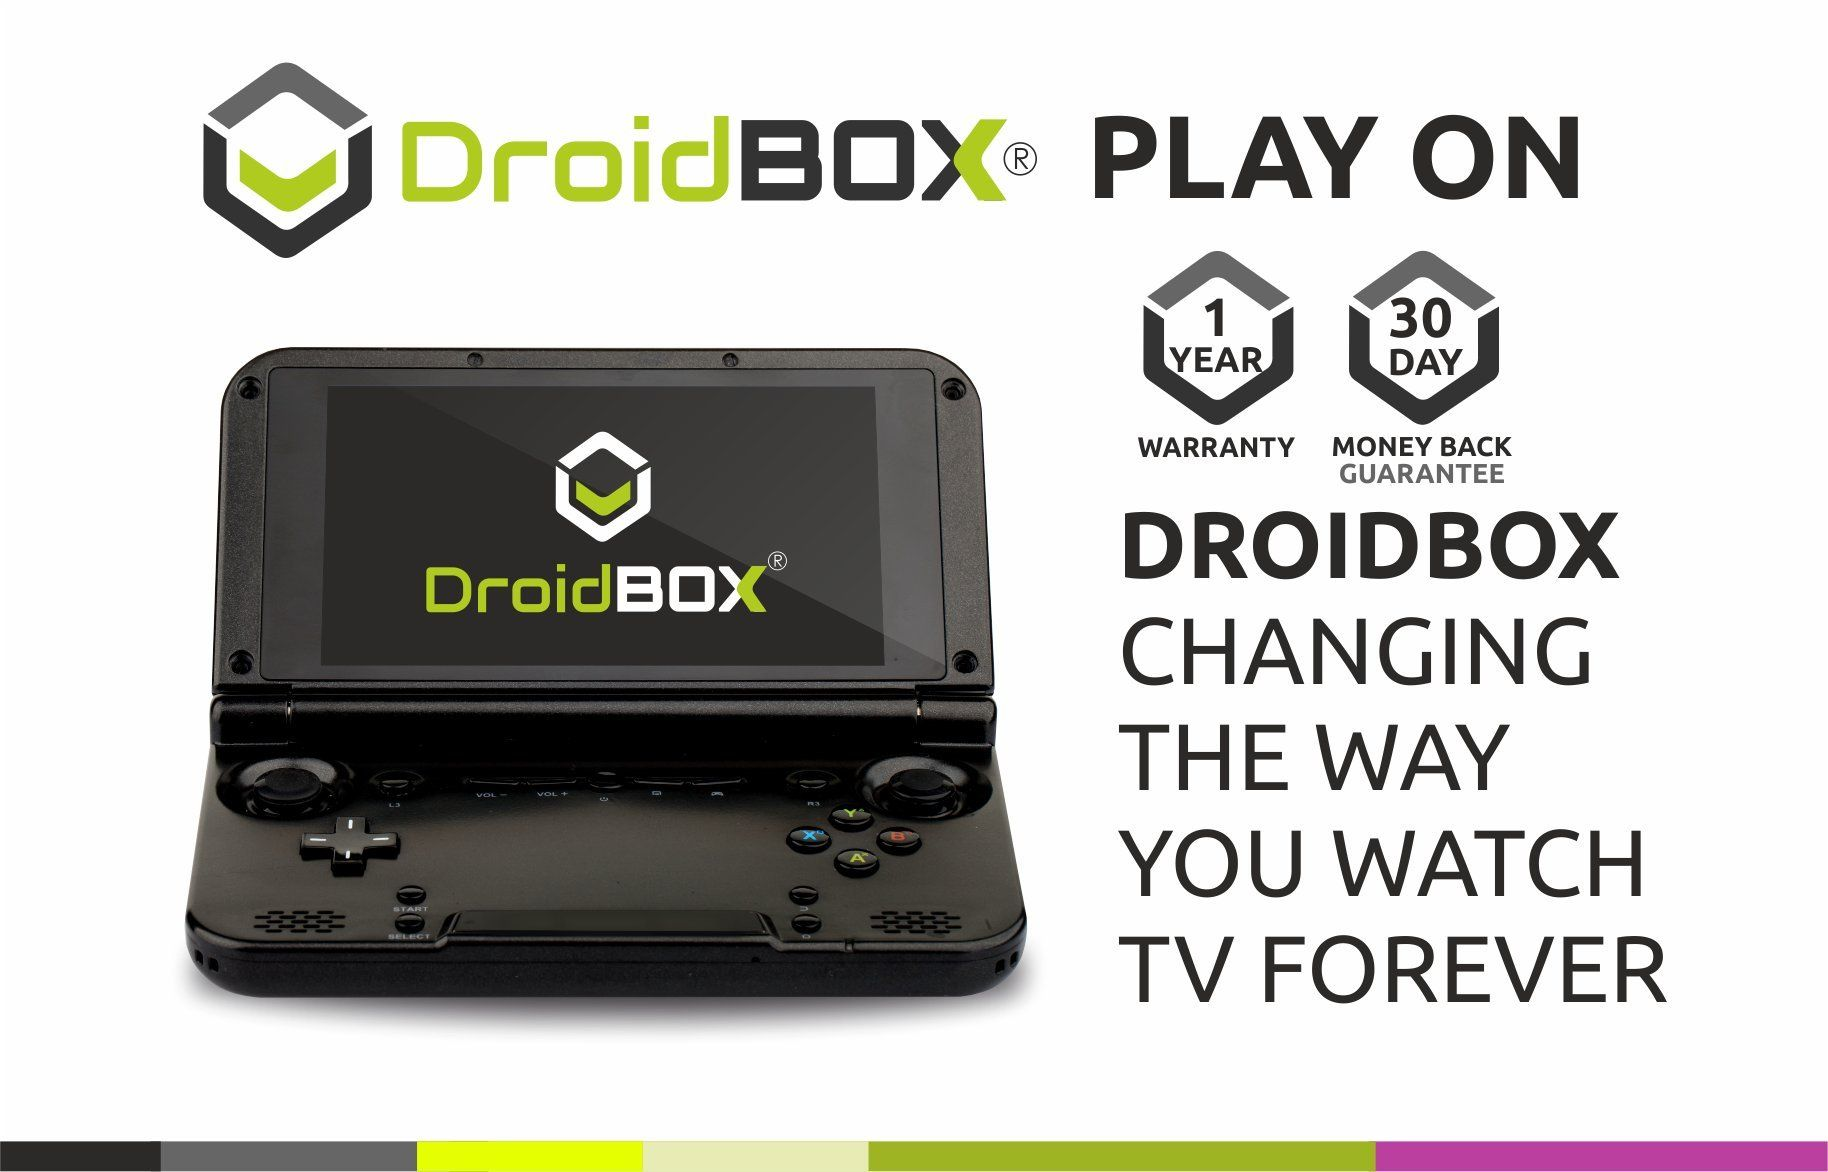 Gpd Xd Droidbox Playon Gamepad Handheld 5 Quot Touchscreen Gaming